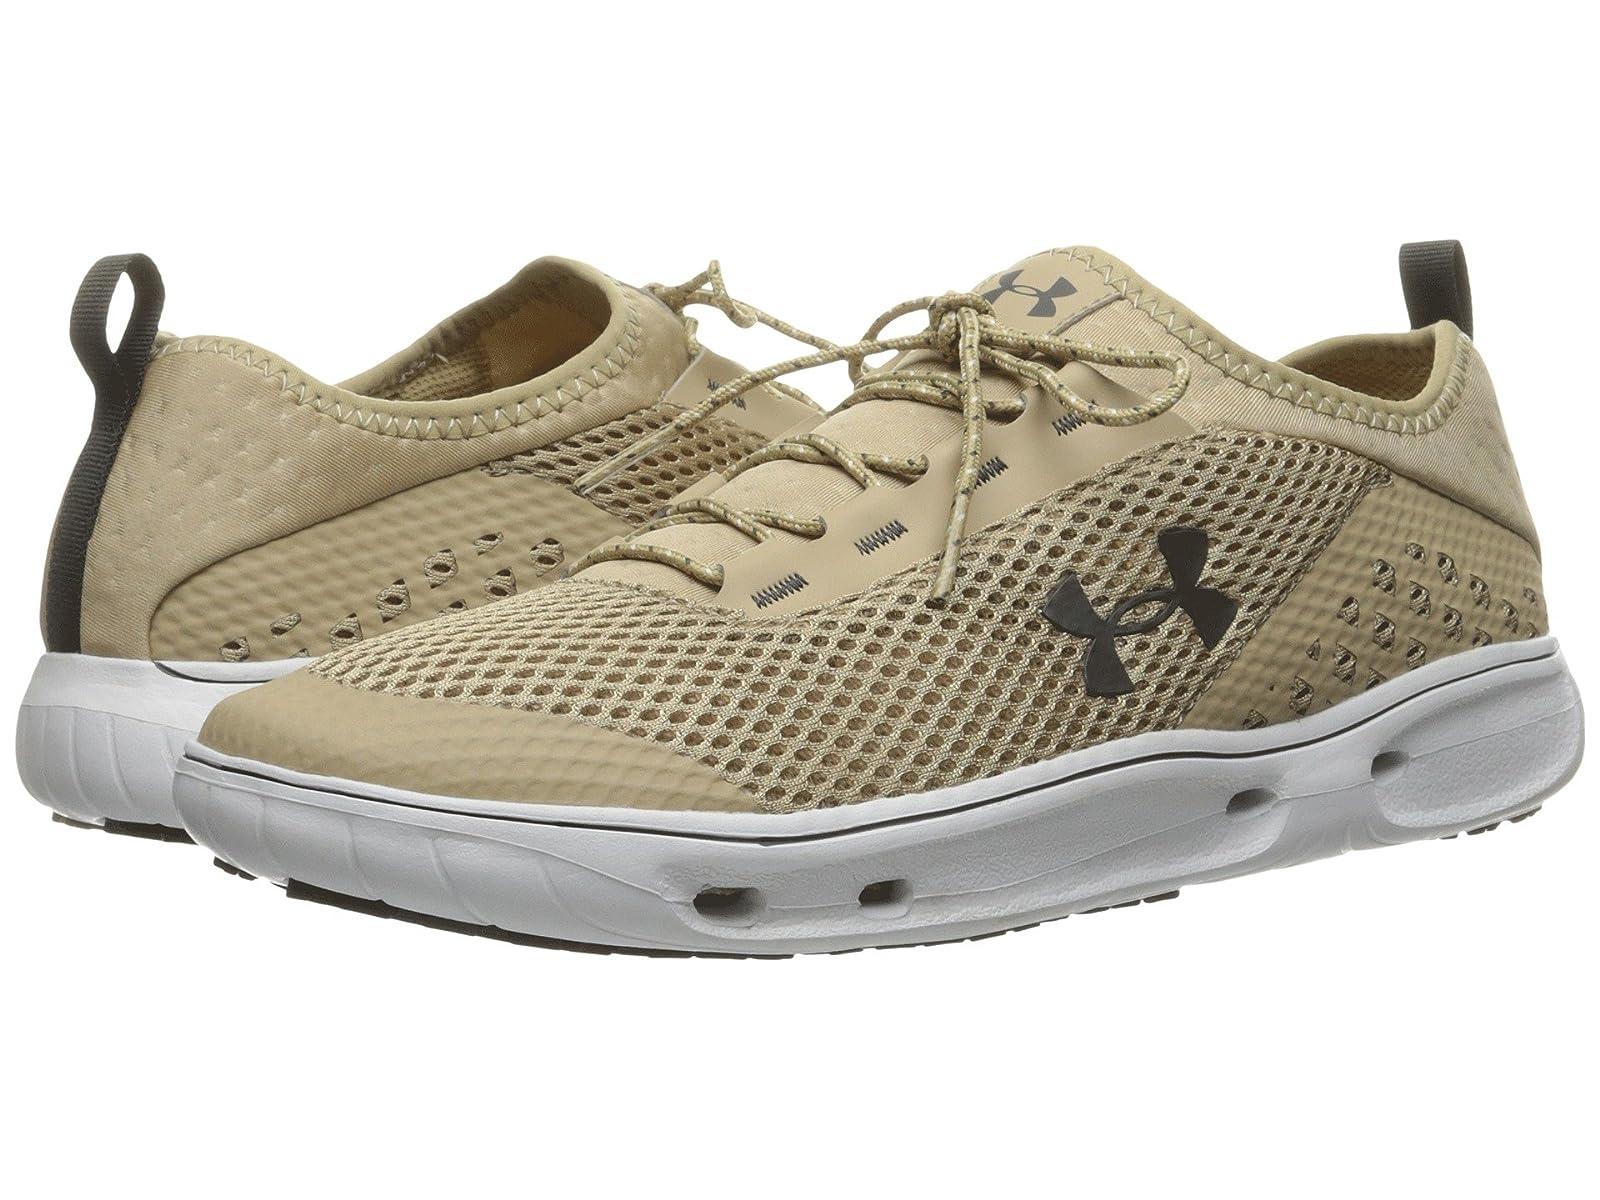 Under Armour UA KilchisAtmospheric grades have affordable shoes